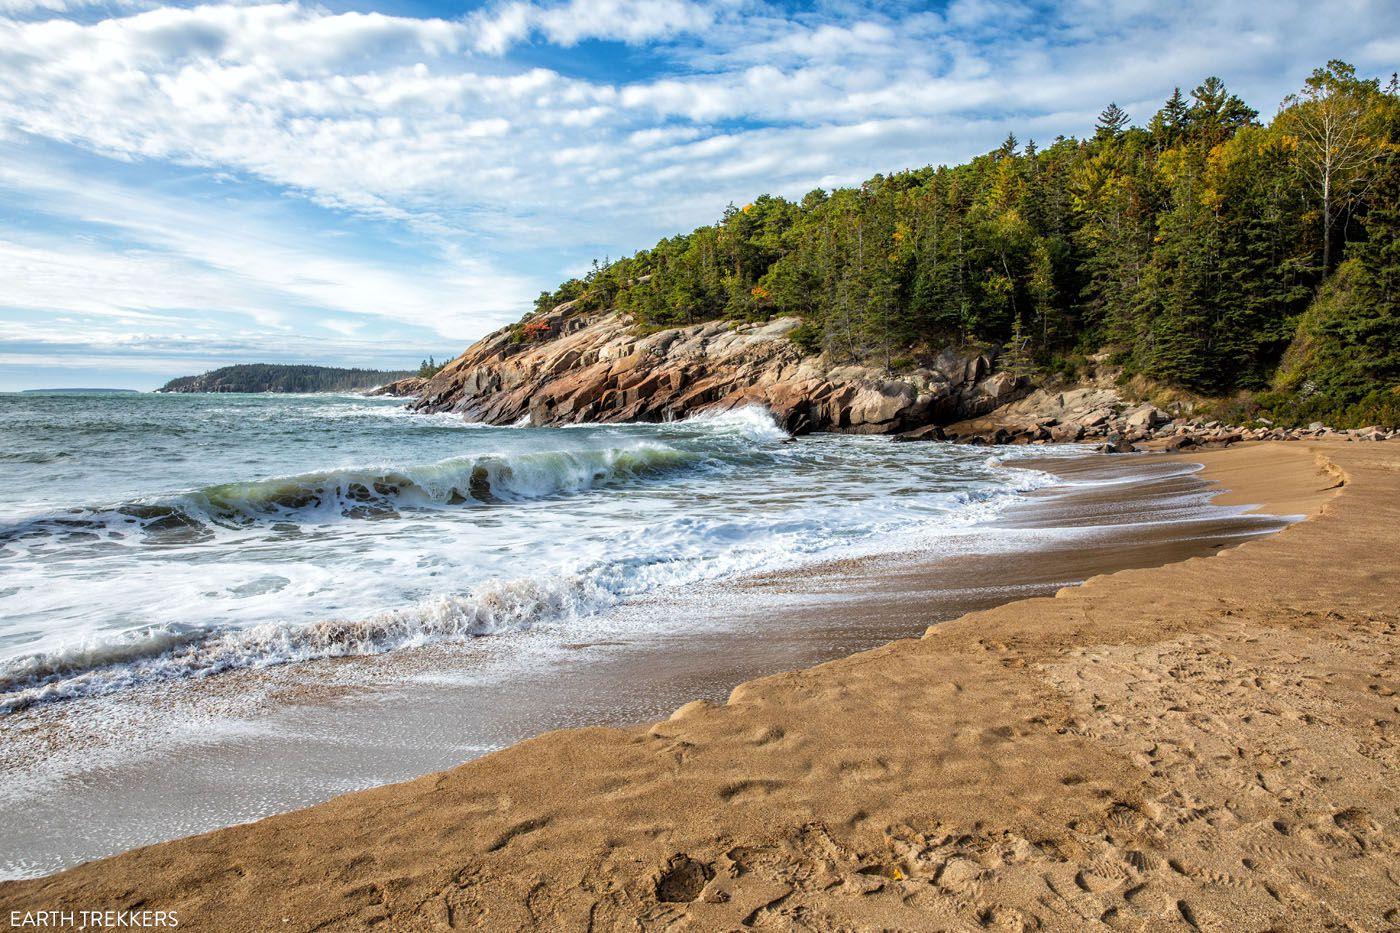 3 Day Acadia National Park Itinerary